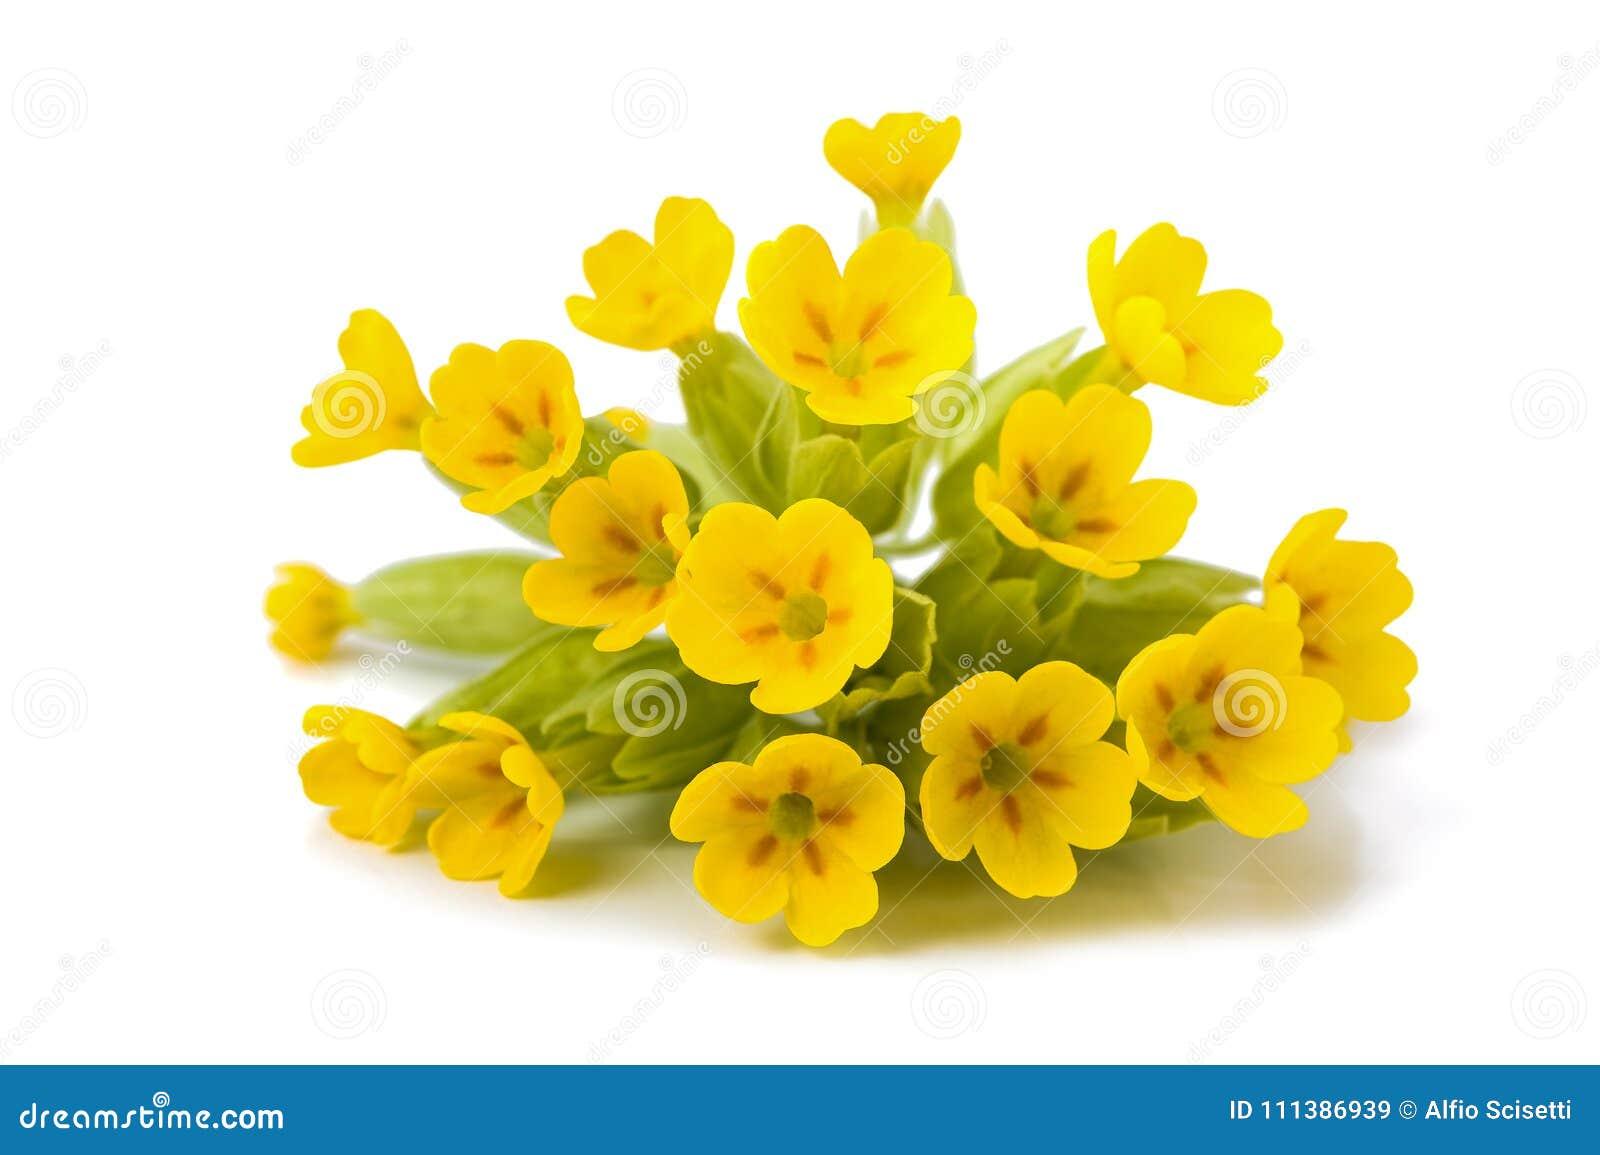 Yellow Primrose Flowers Stock Image Image Of Common 111386939